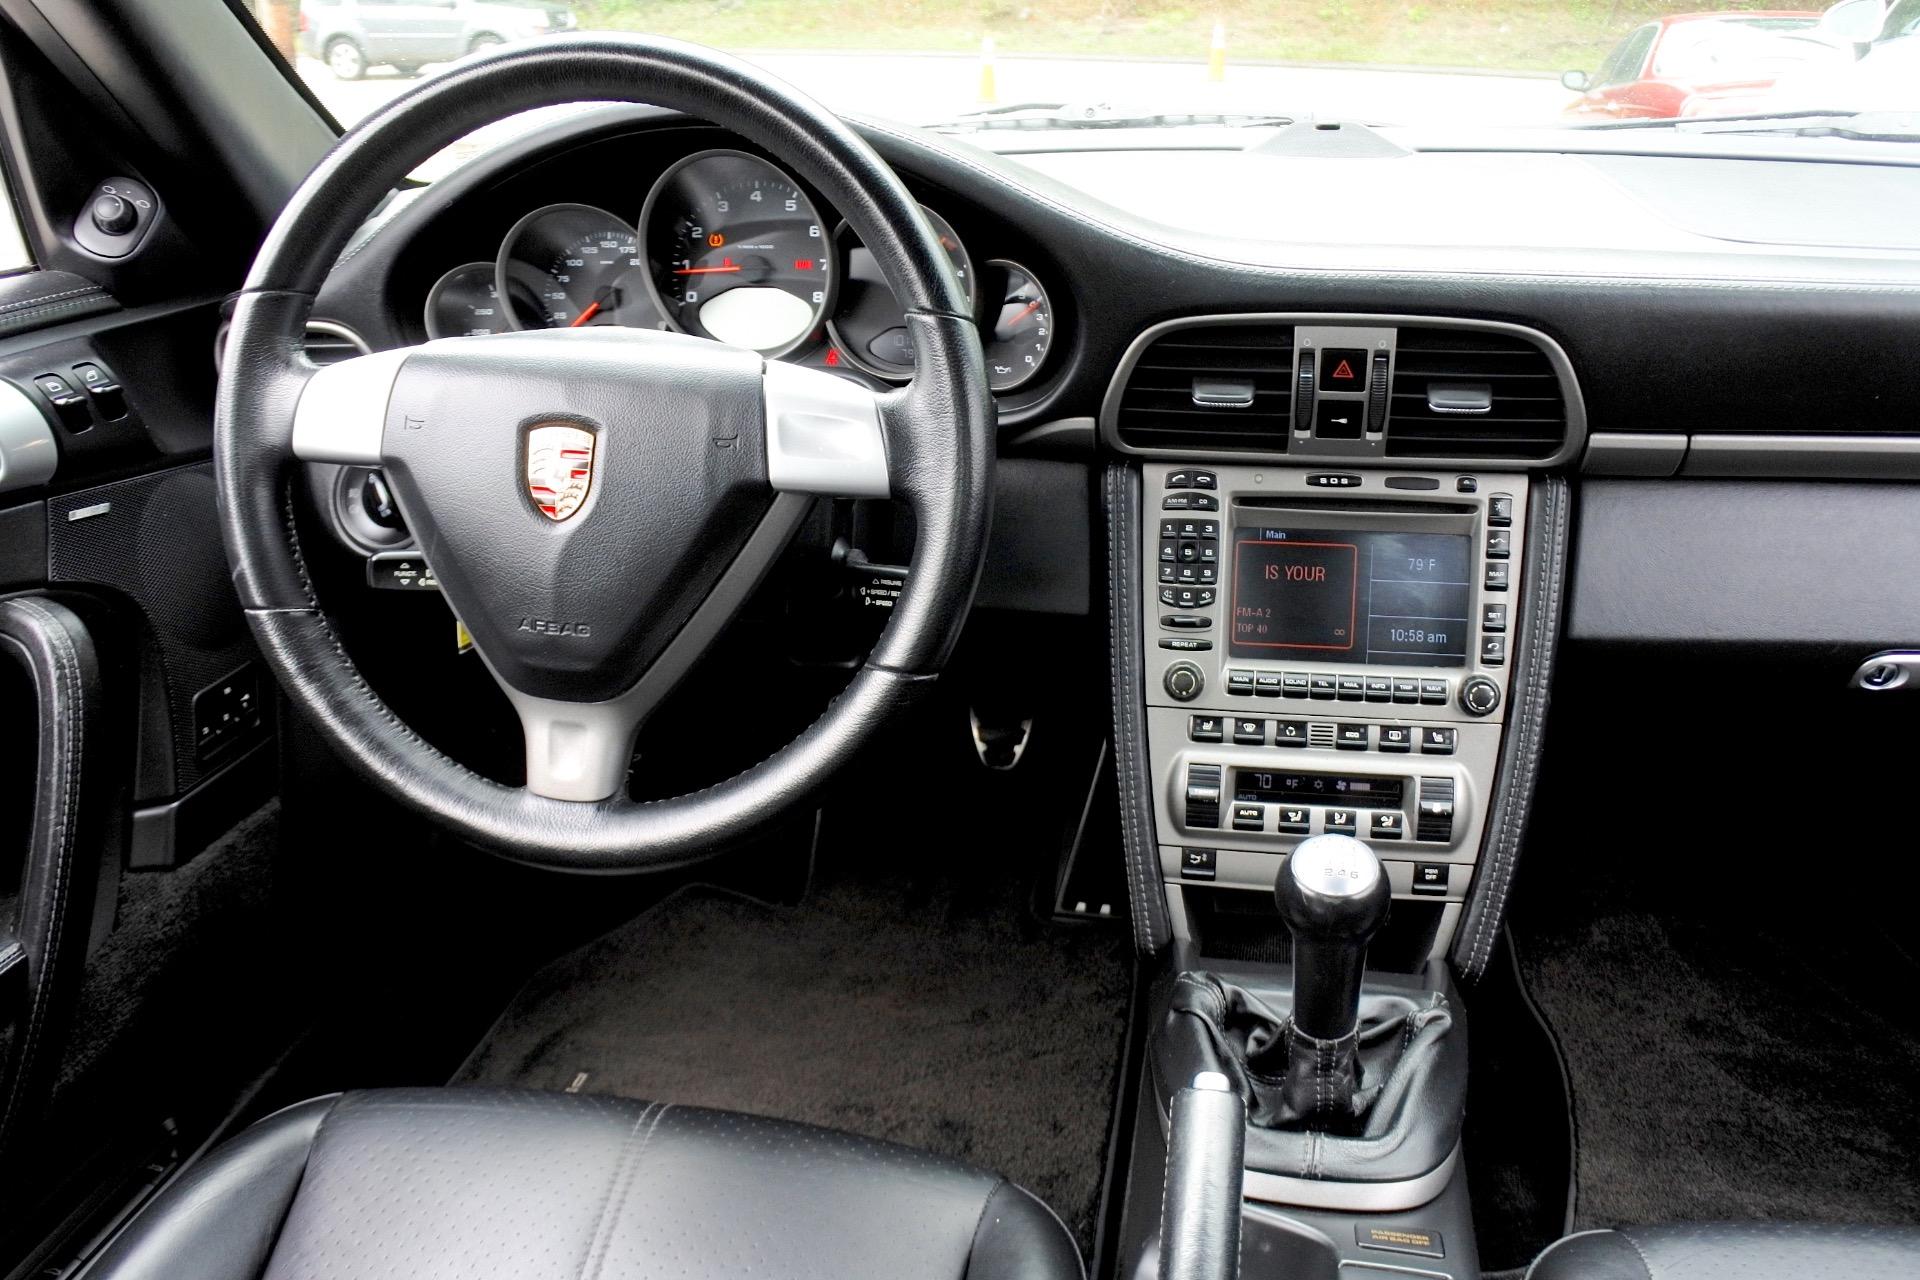 Used 2006 Porsche 911 Carrera 4 Used 2006 Porsche 911 Carrera 4 for sale  at Metro West Motorcars LLC in Shrewsbury MA 10